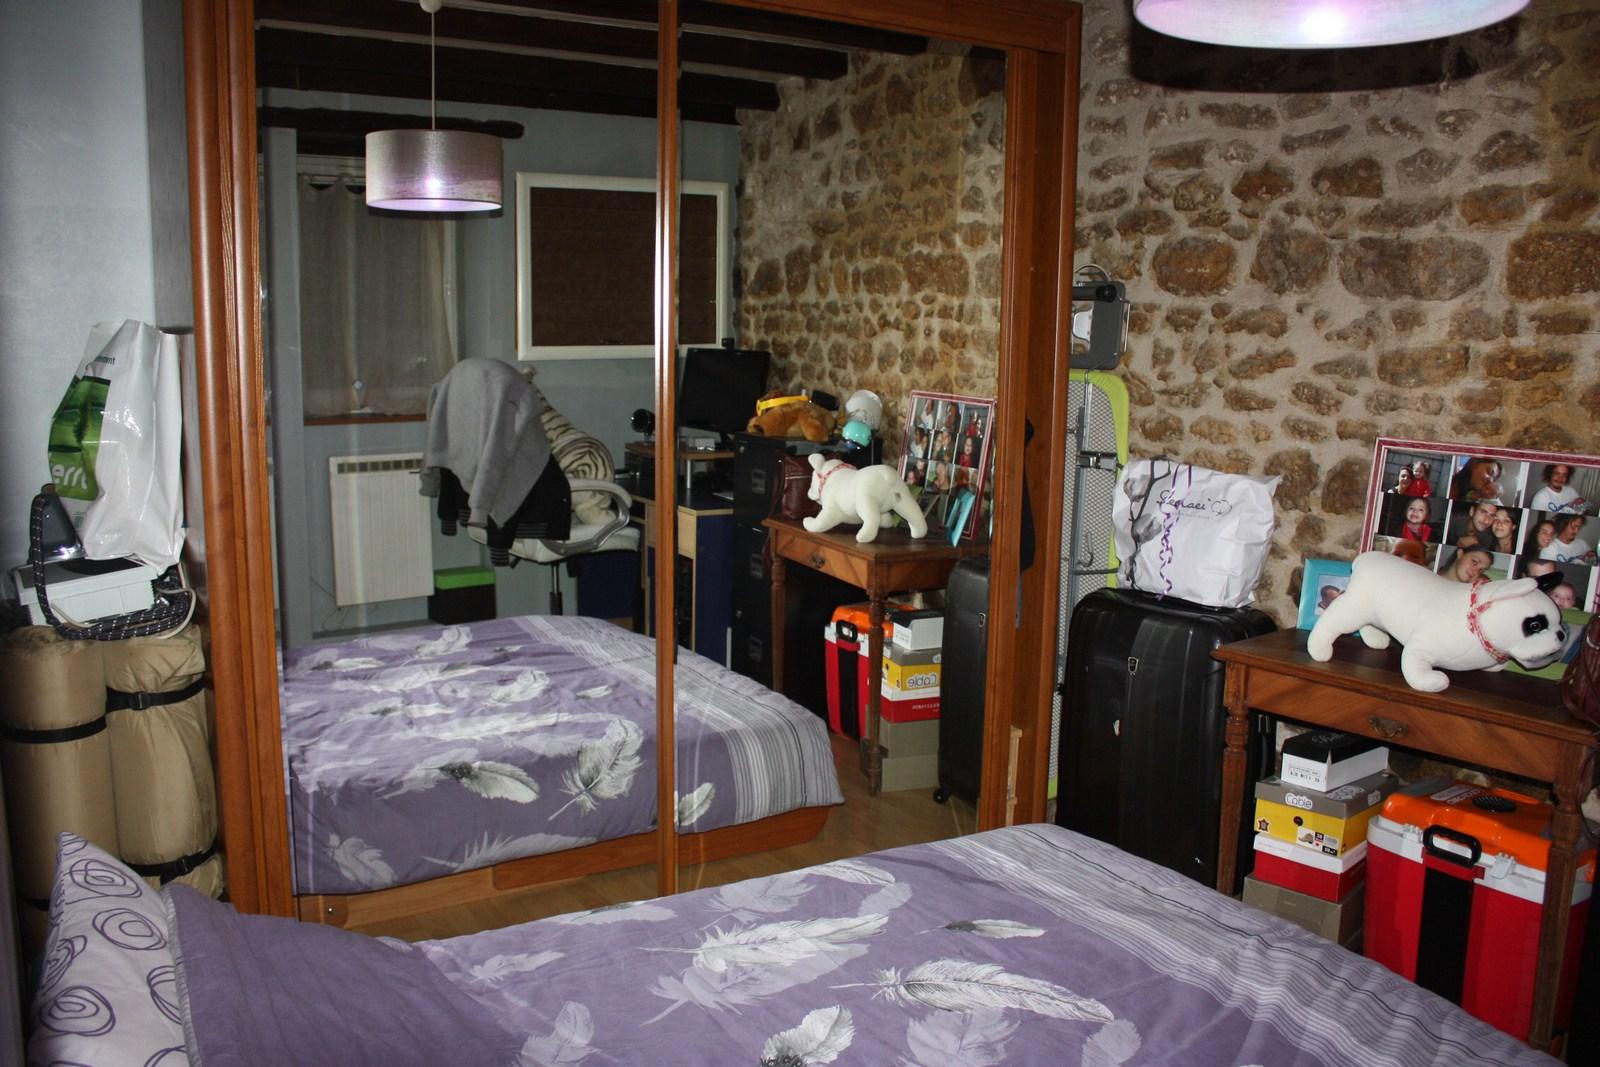 Vente appartement bouray juine centre village n dy65508 for Appartement atypique essonne